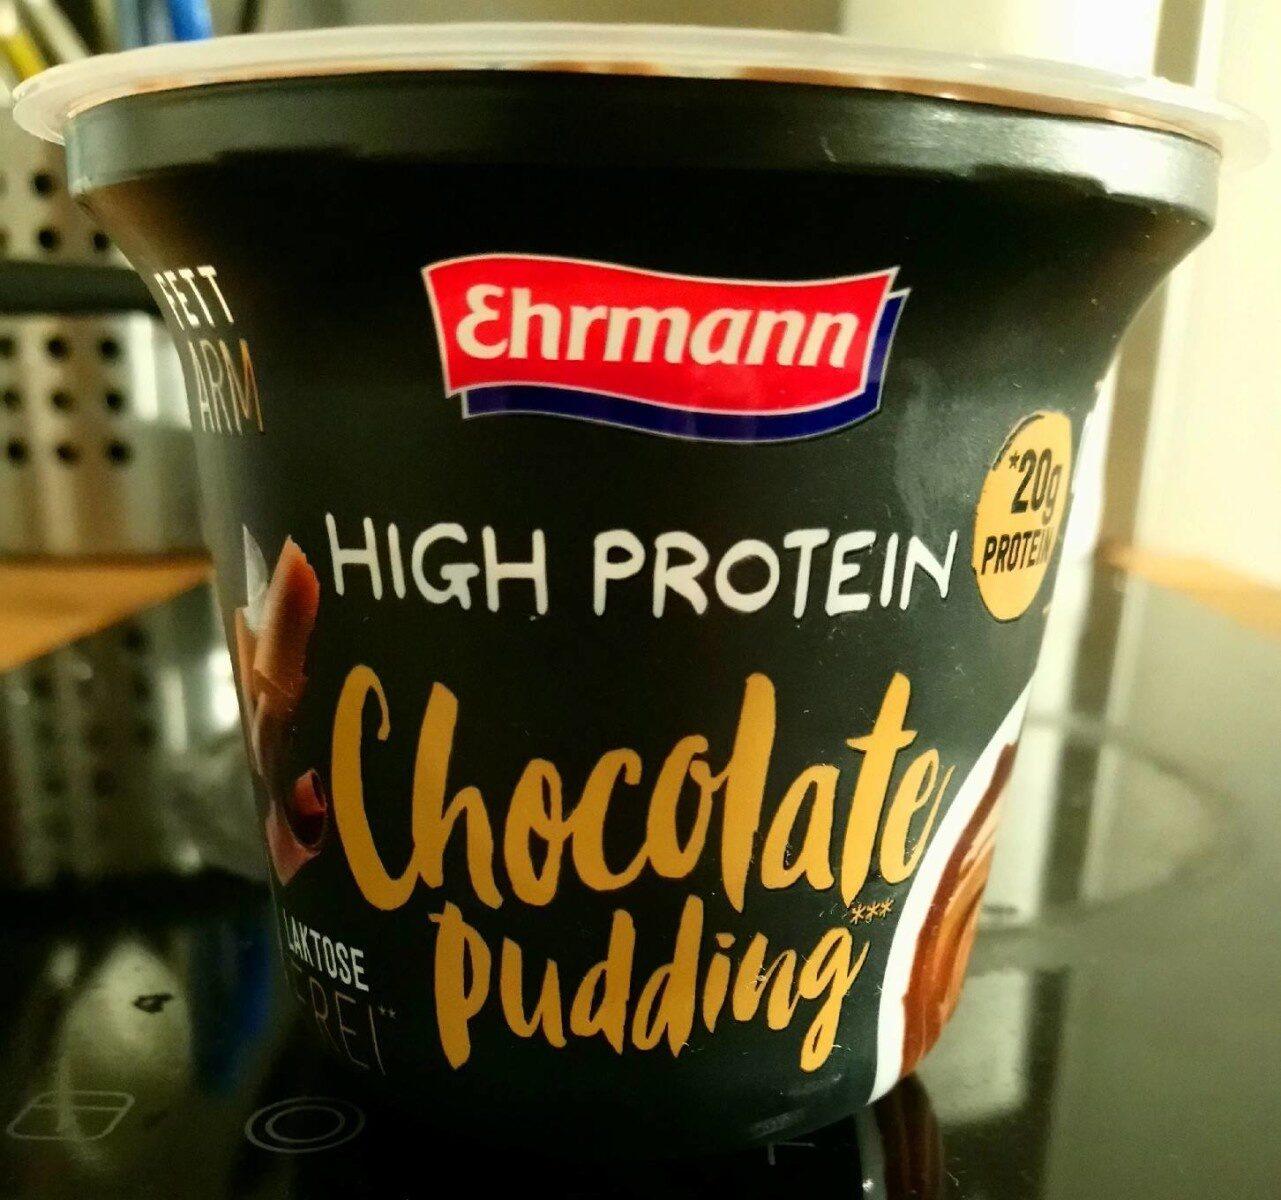 High Protein Chocolate pudding - Produkt - de